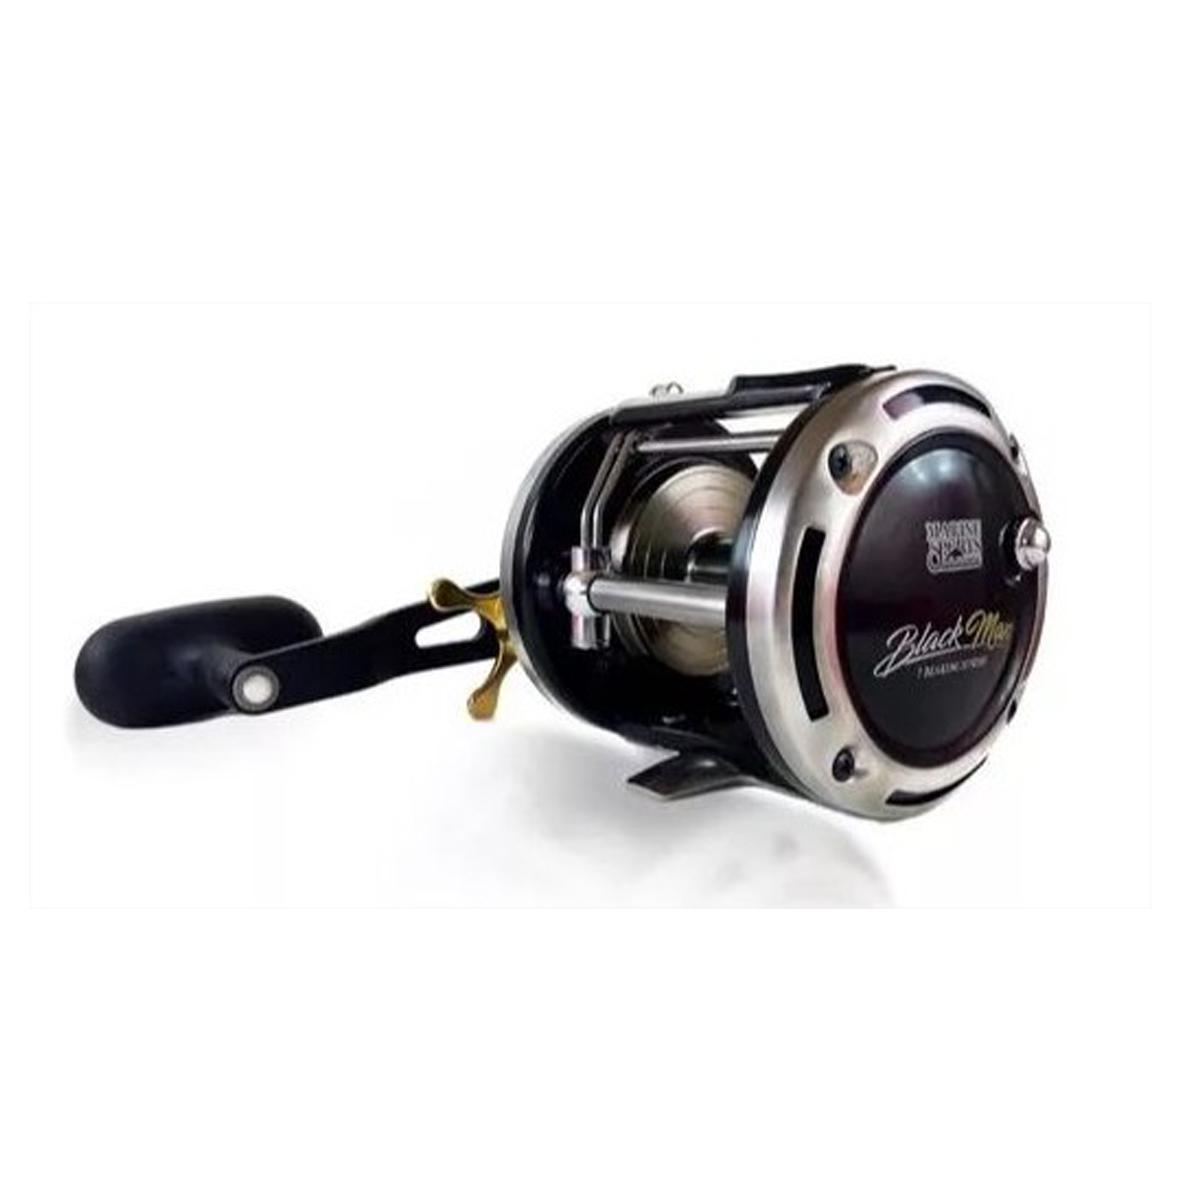 Carretilha Marine Sports Black Max 20 (Direita)  - Pró Pesca Shop